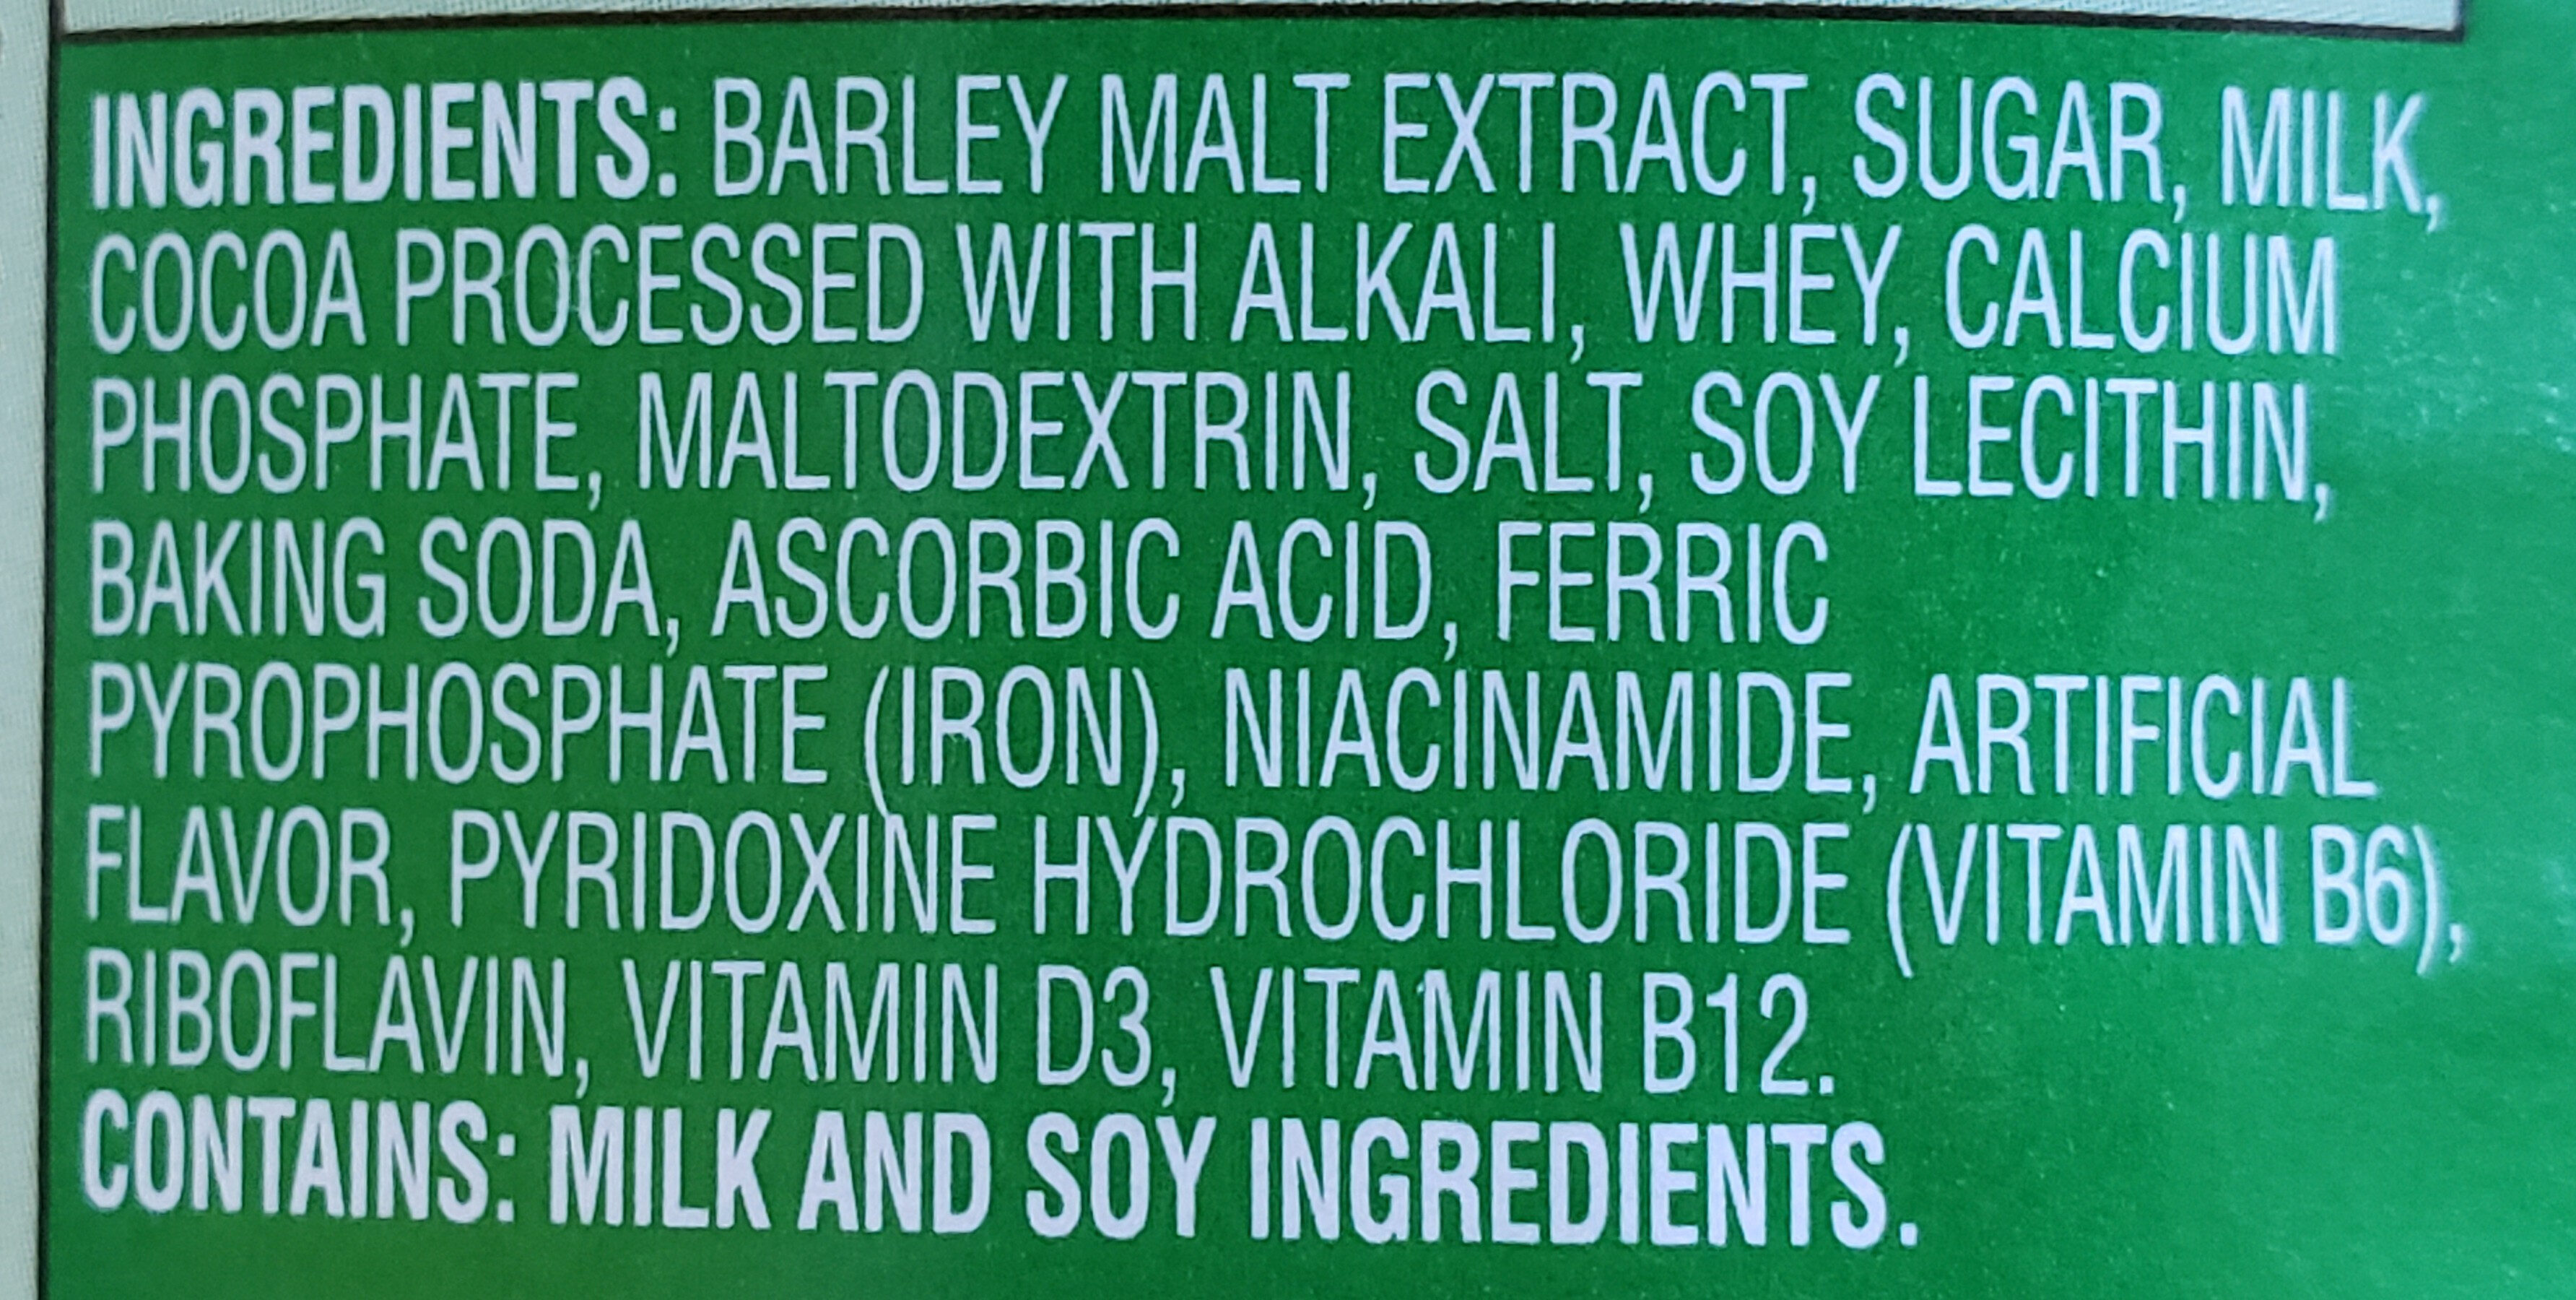 Nutritional drink mix - Ingredients - en